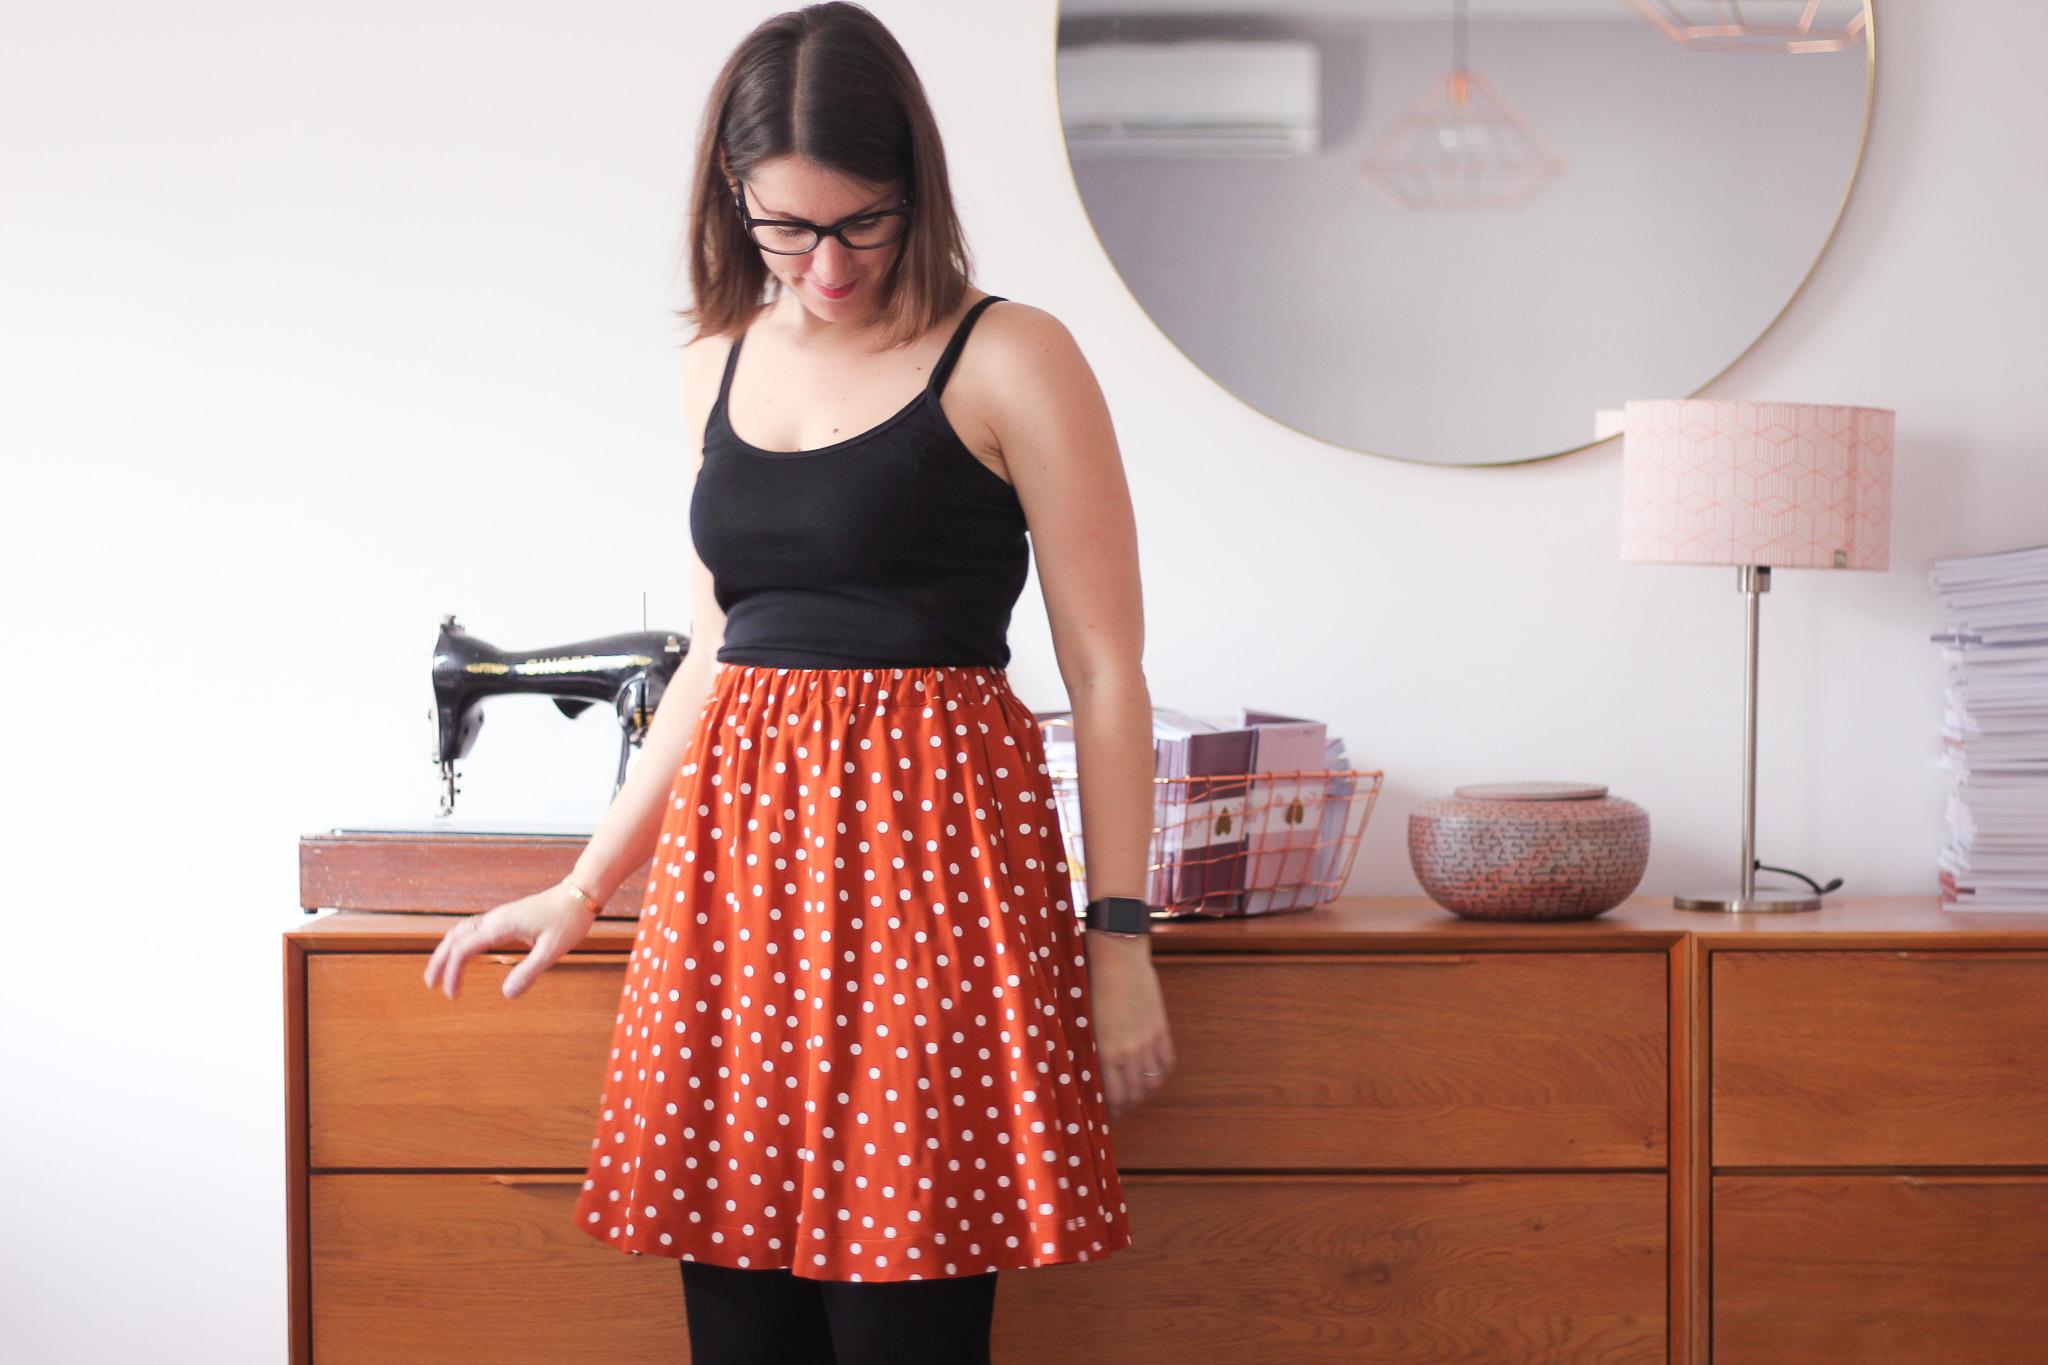 Jupe Bonjour - Atelier Scammit - Tissu Dancing Polka - Lise Tailor